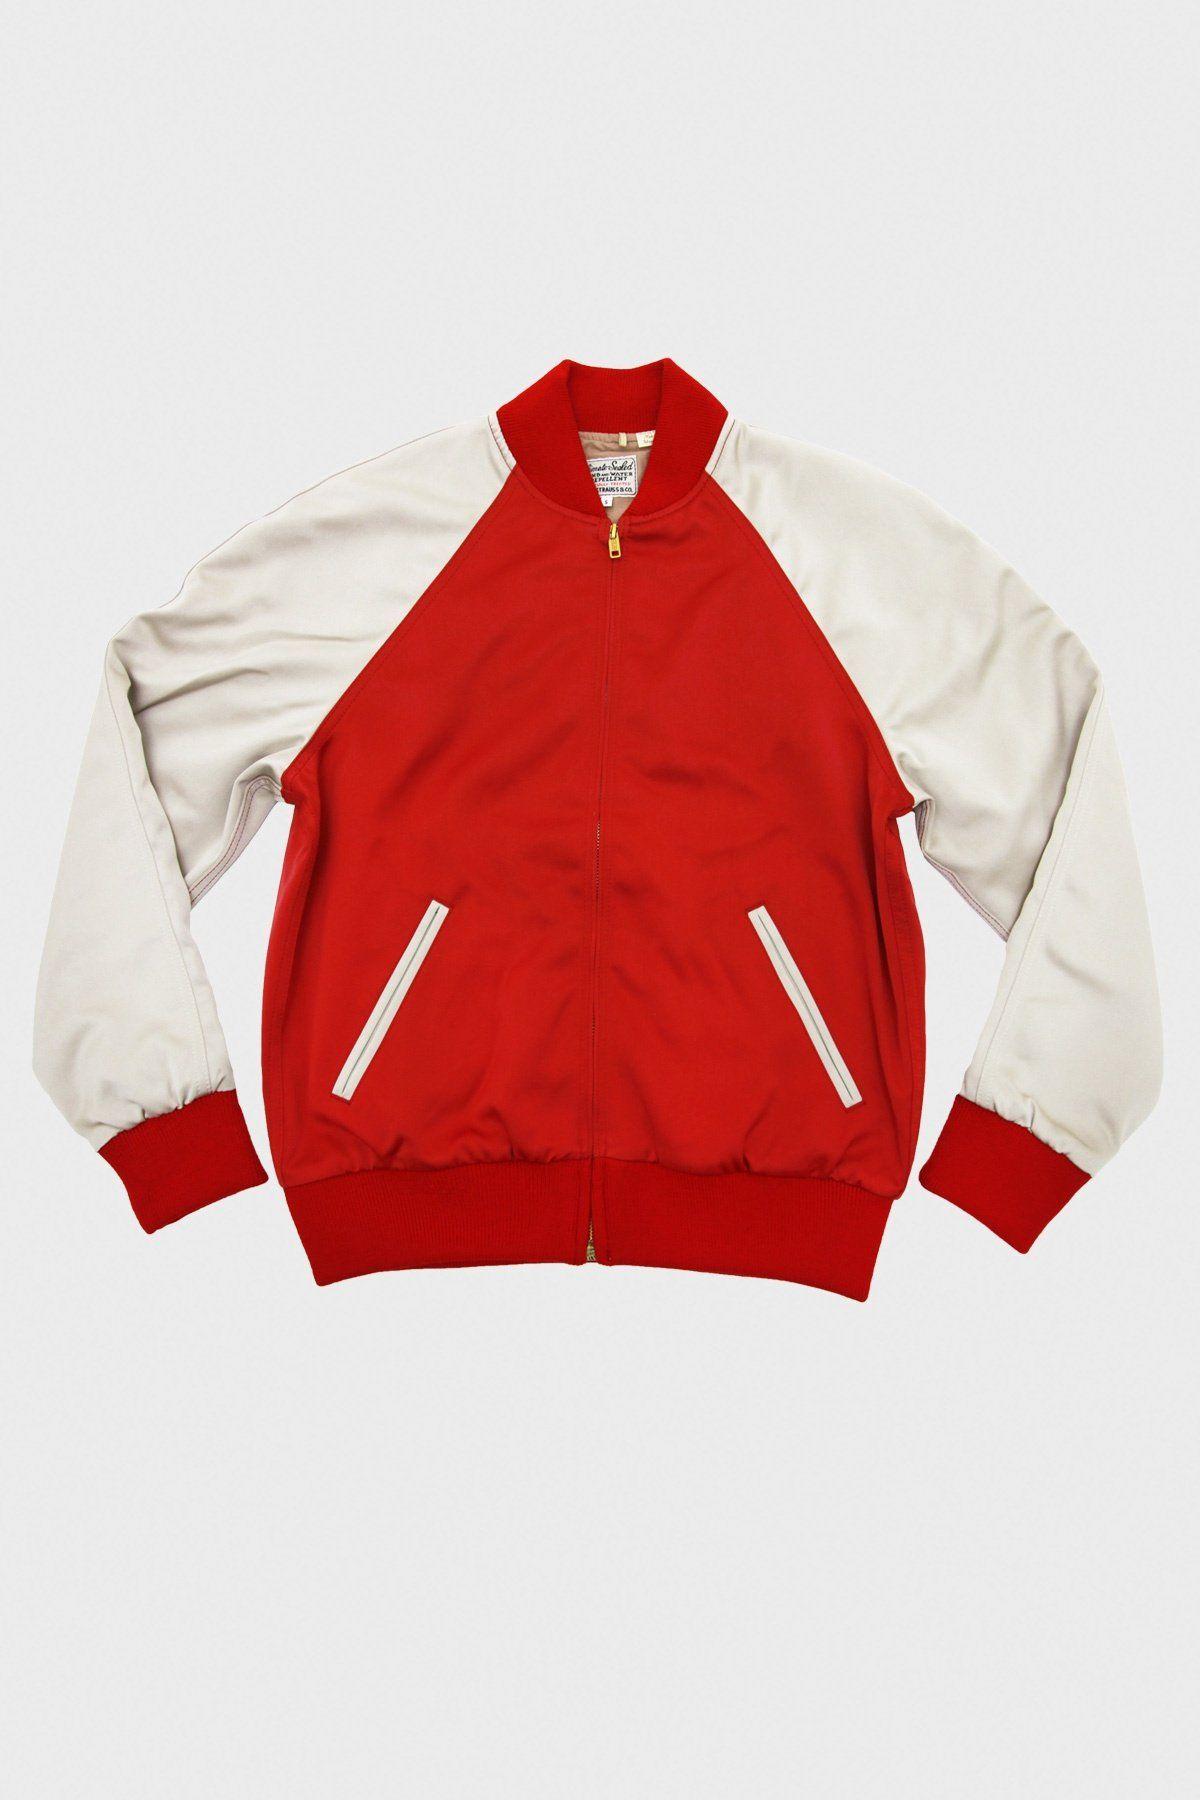 Levi S Vintage Clothing Climate Seal Bomber Jacket In Red Bomber Jacket Vintage Red Bomber Jacket Raglan Sleeve Bomber Jacket [ 1800 x 1200 Pixel ]